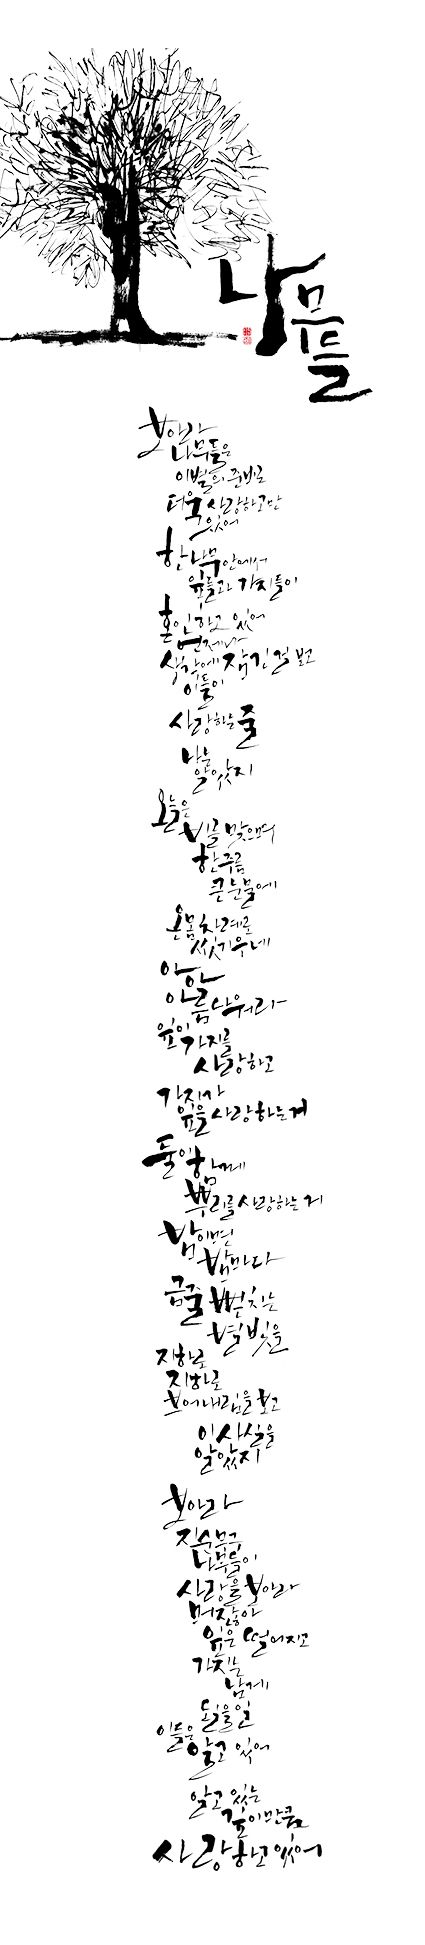 "Korean calligraphy - Poem ""Trees"" 나무들 by Kim Namjo 김남조"